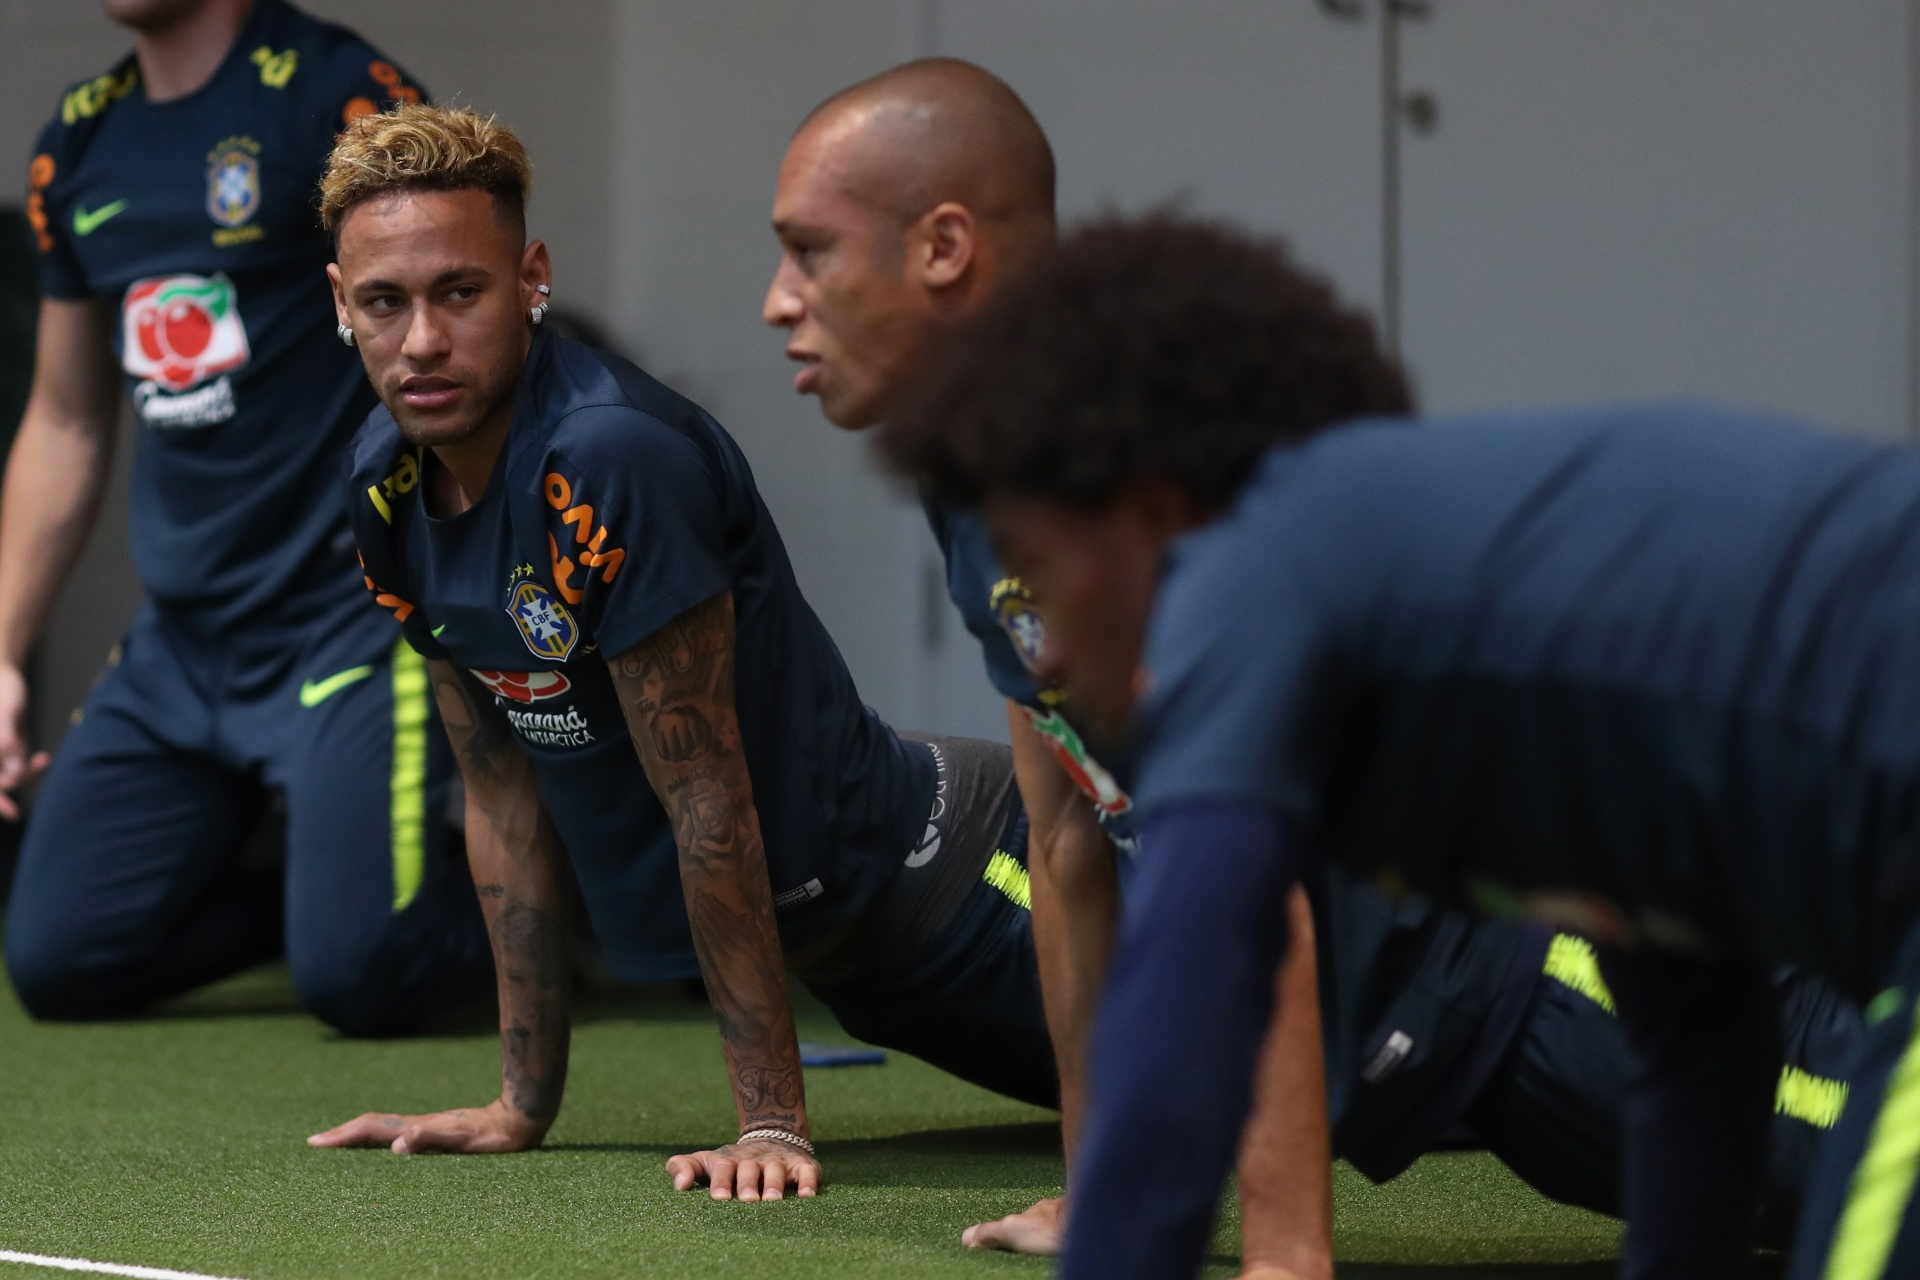 Neymar Miranda seleção brasileira treino f43885dce7591